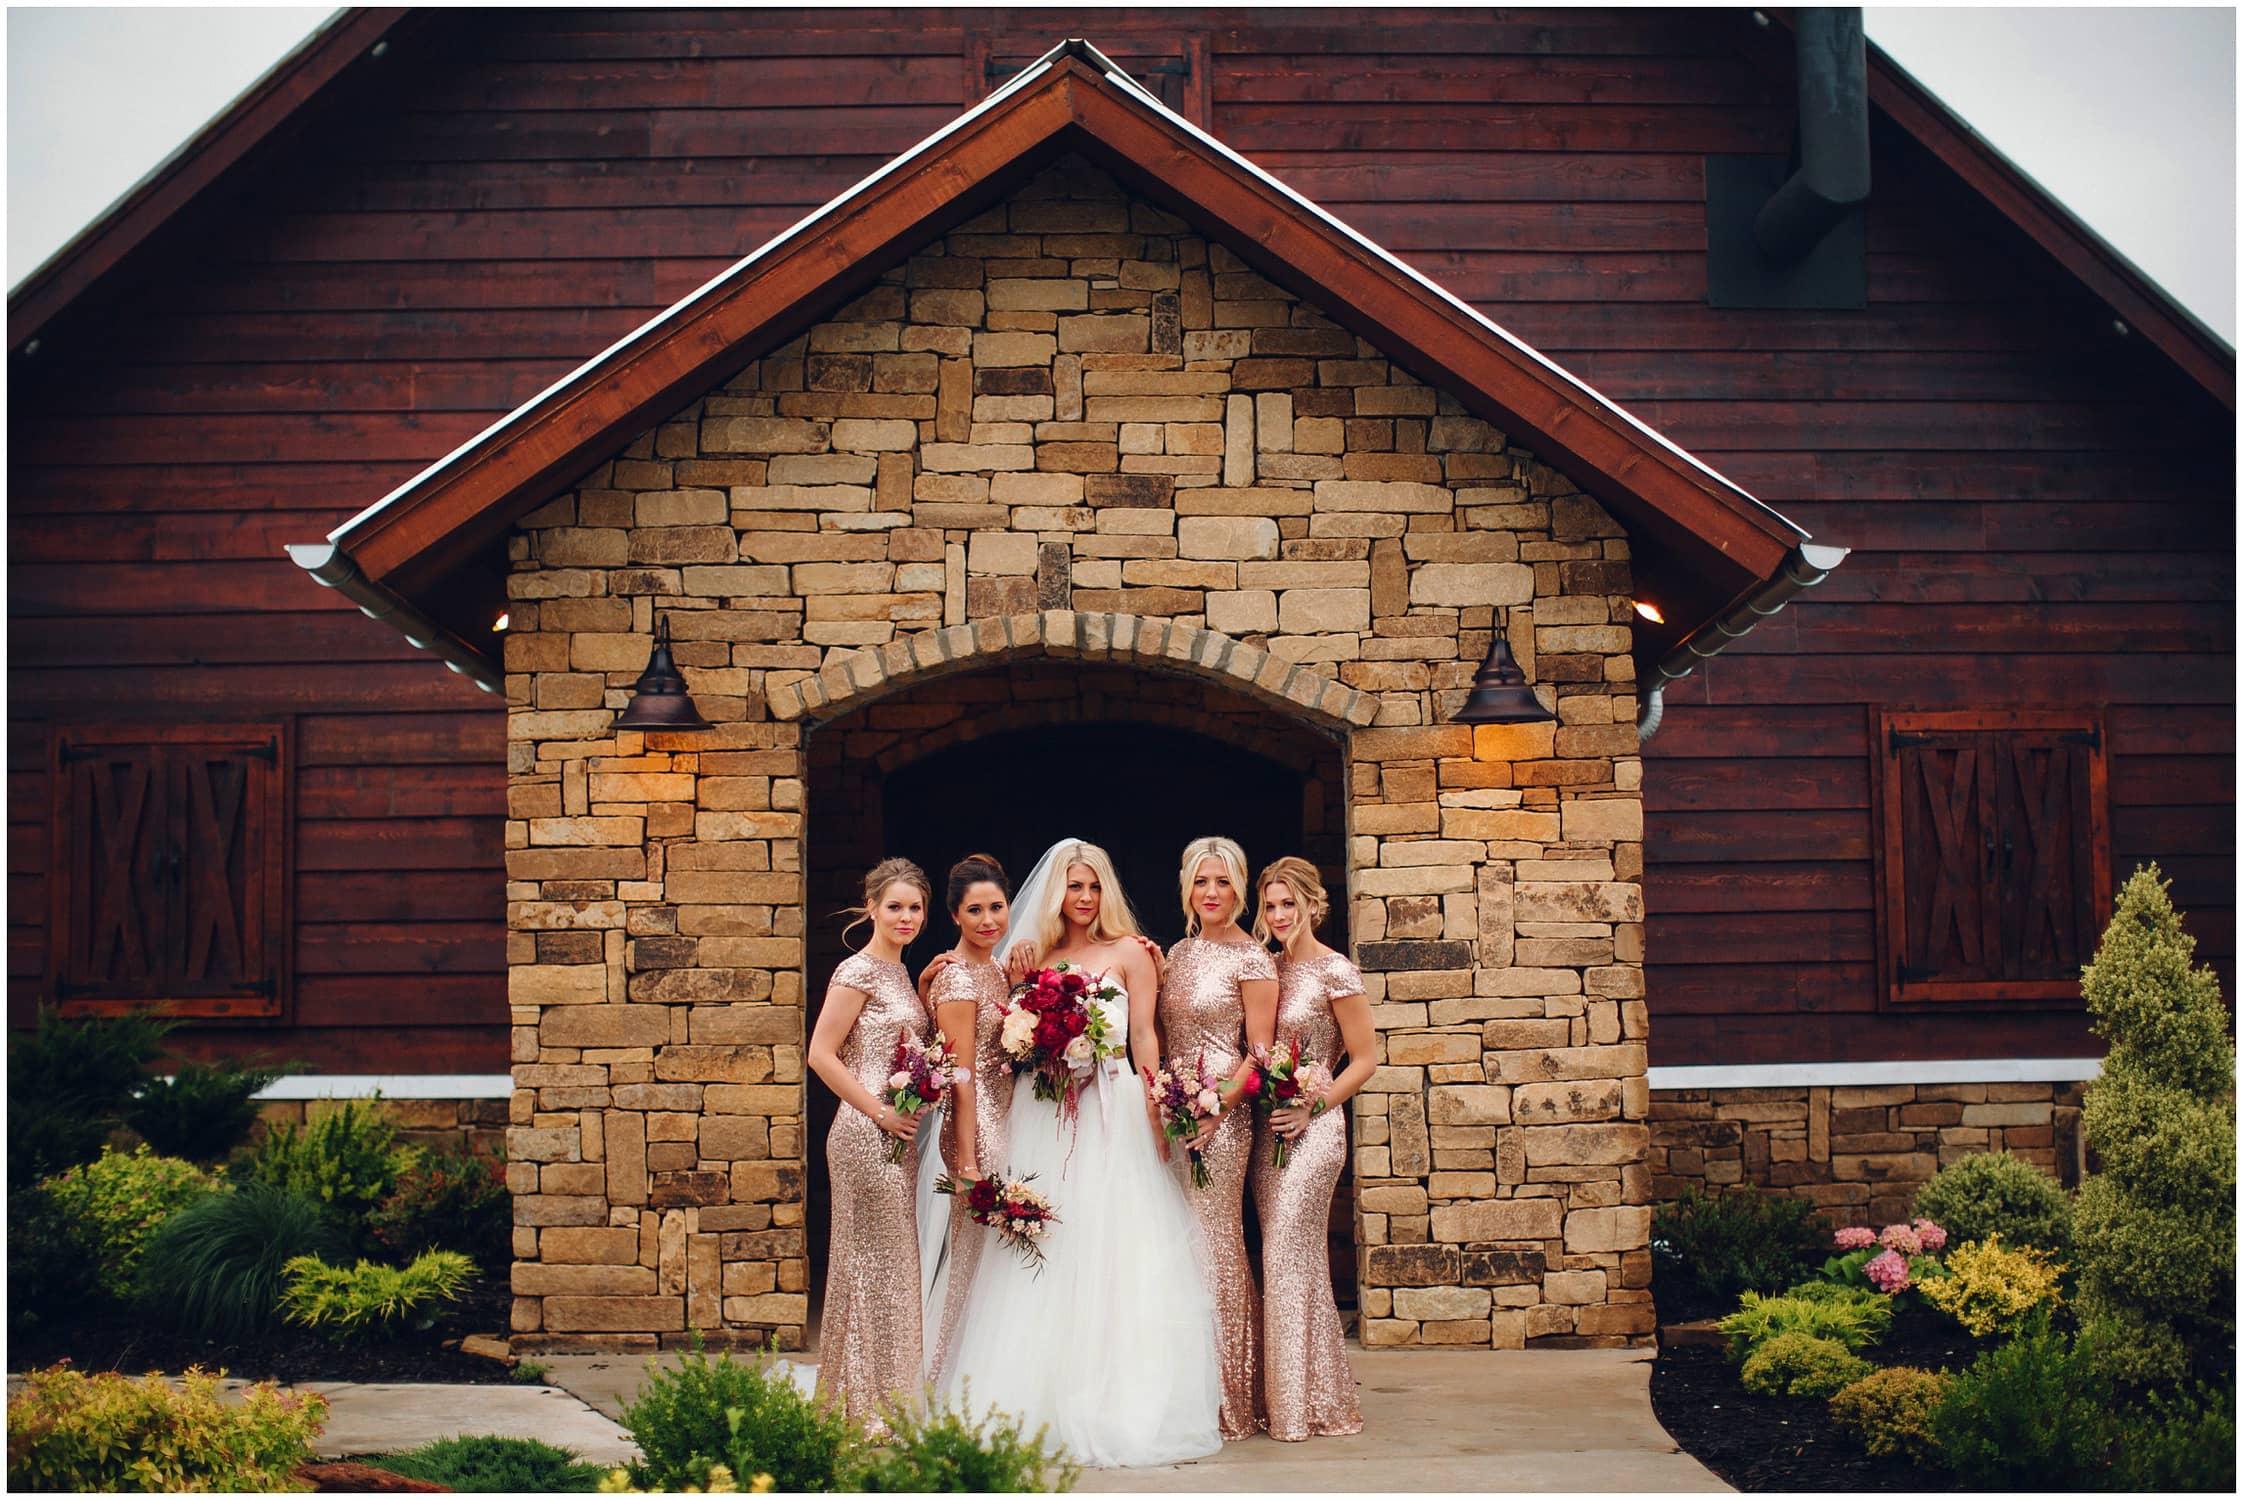 southwindhills_oklahoma_wedding0532_blogstomped